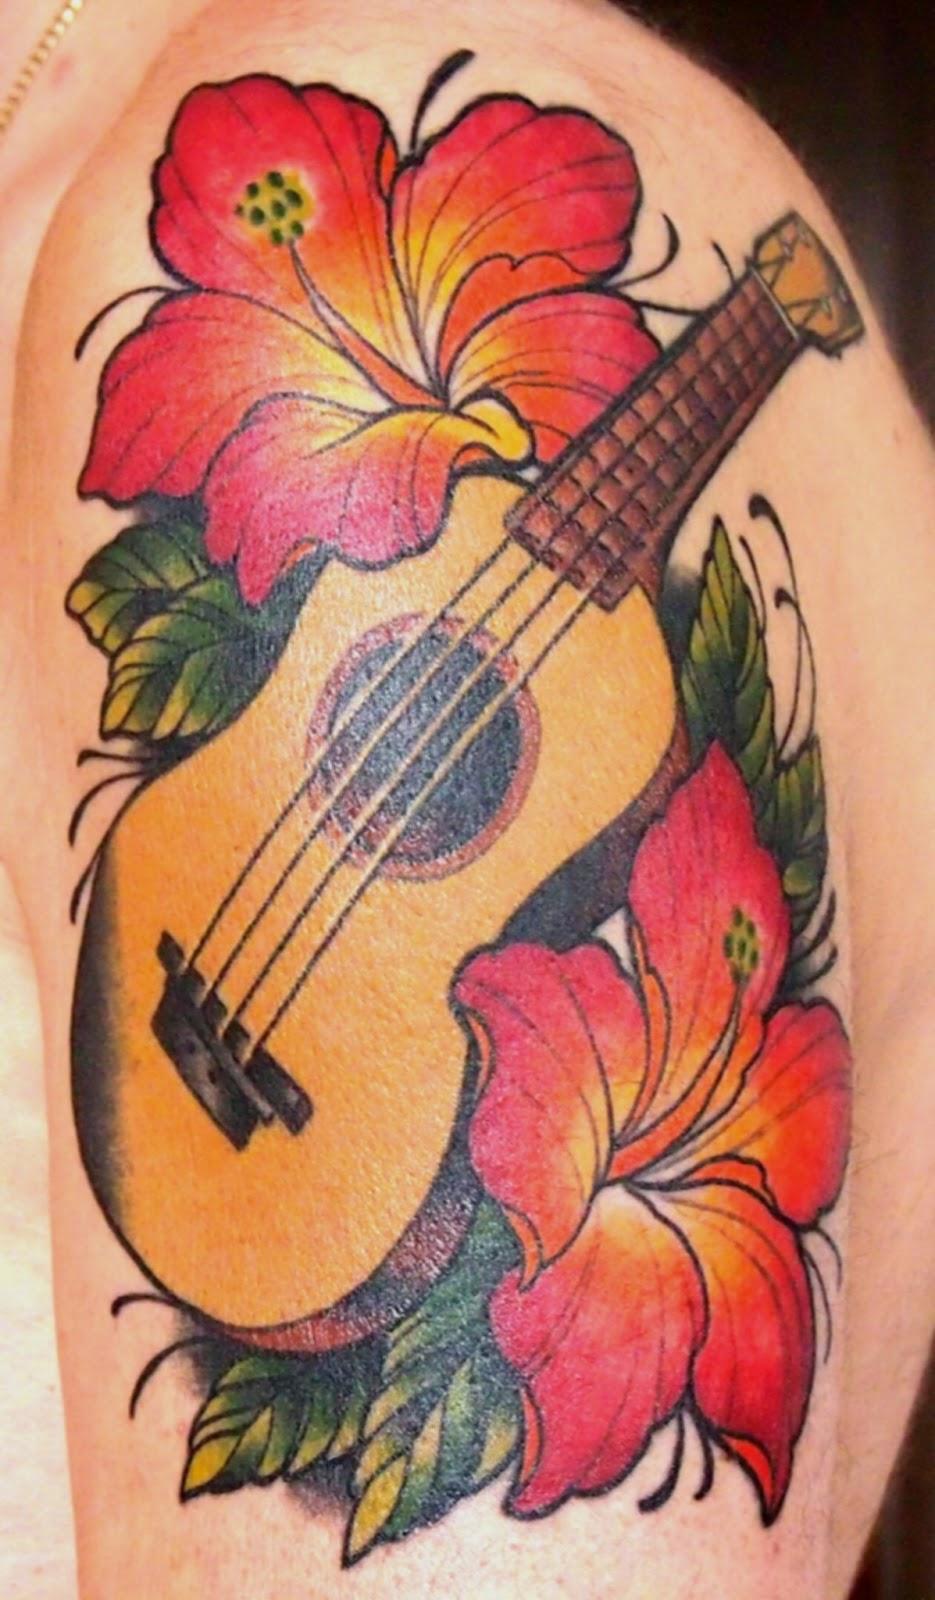 Tattoo Uke, Continued